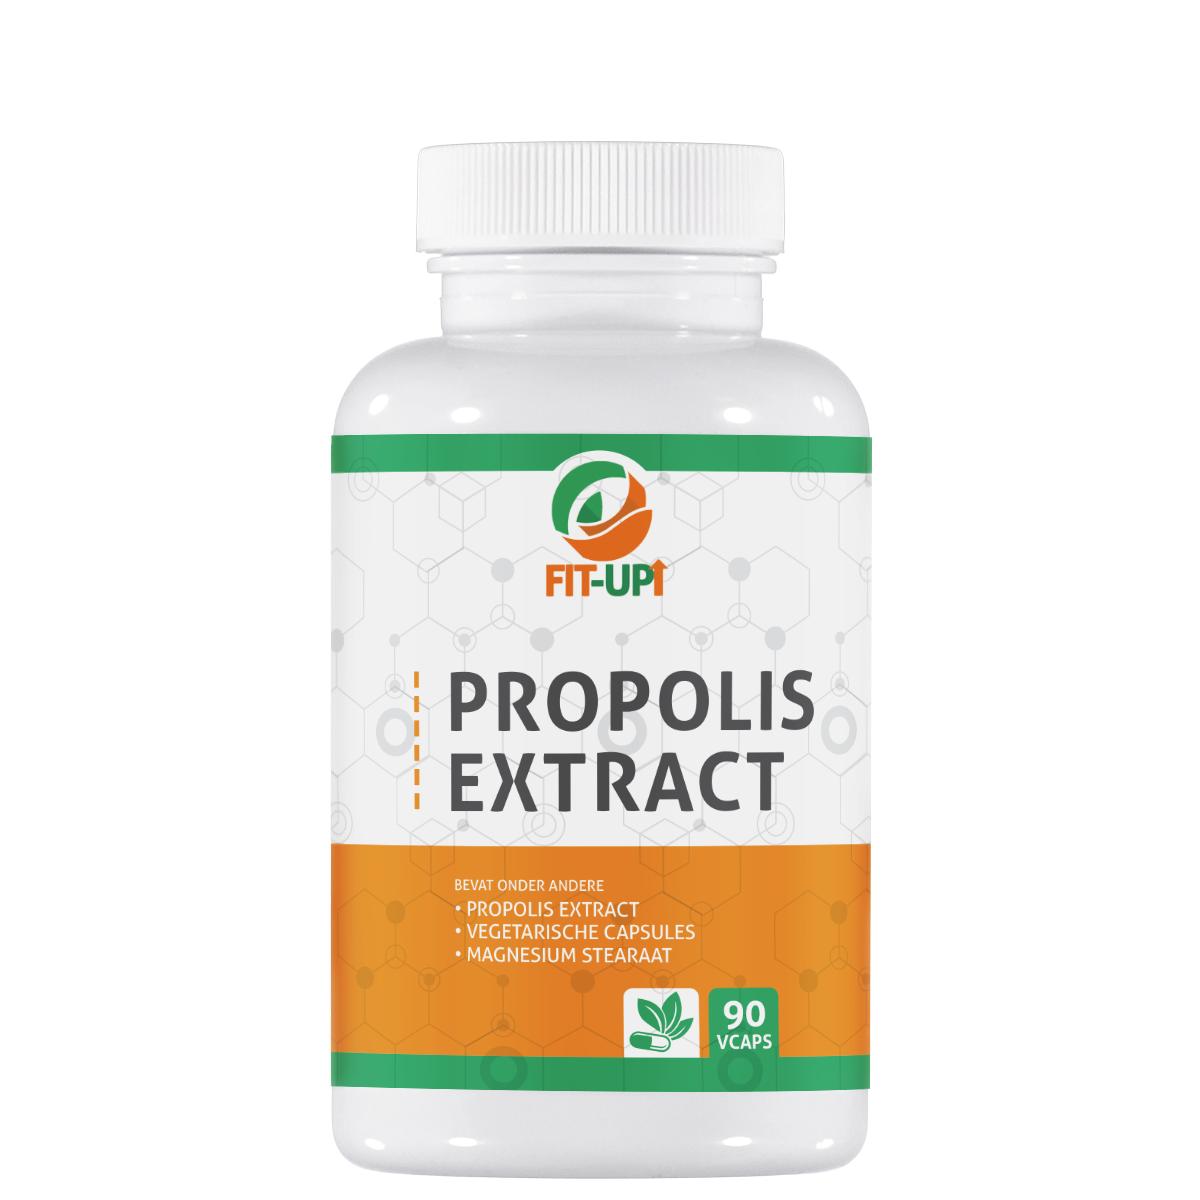 Propolis extract - 90 capsules